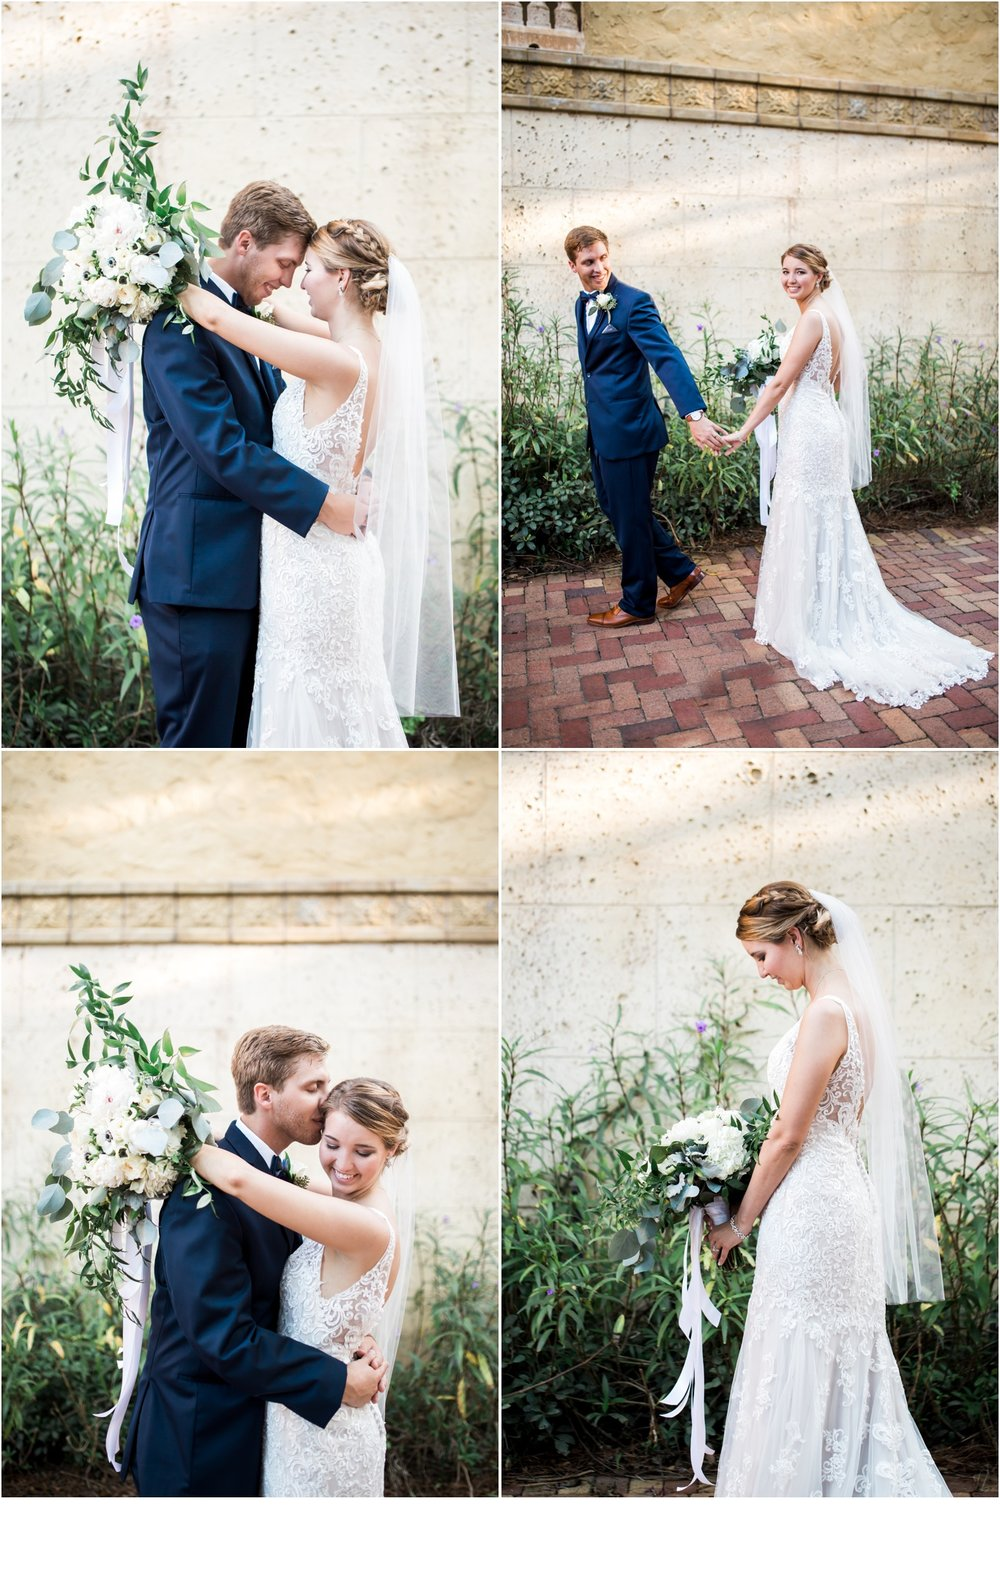 Rainey_Gregg_Photography_St._Simons_Island_Georgia_California_Wedding_Portrait_Photography_0672.jpg